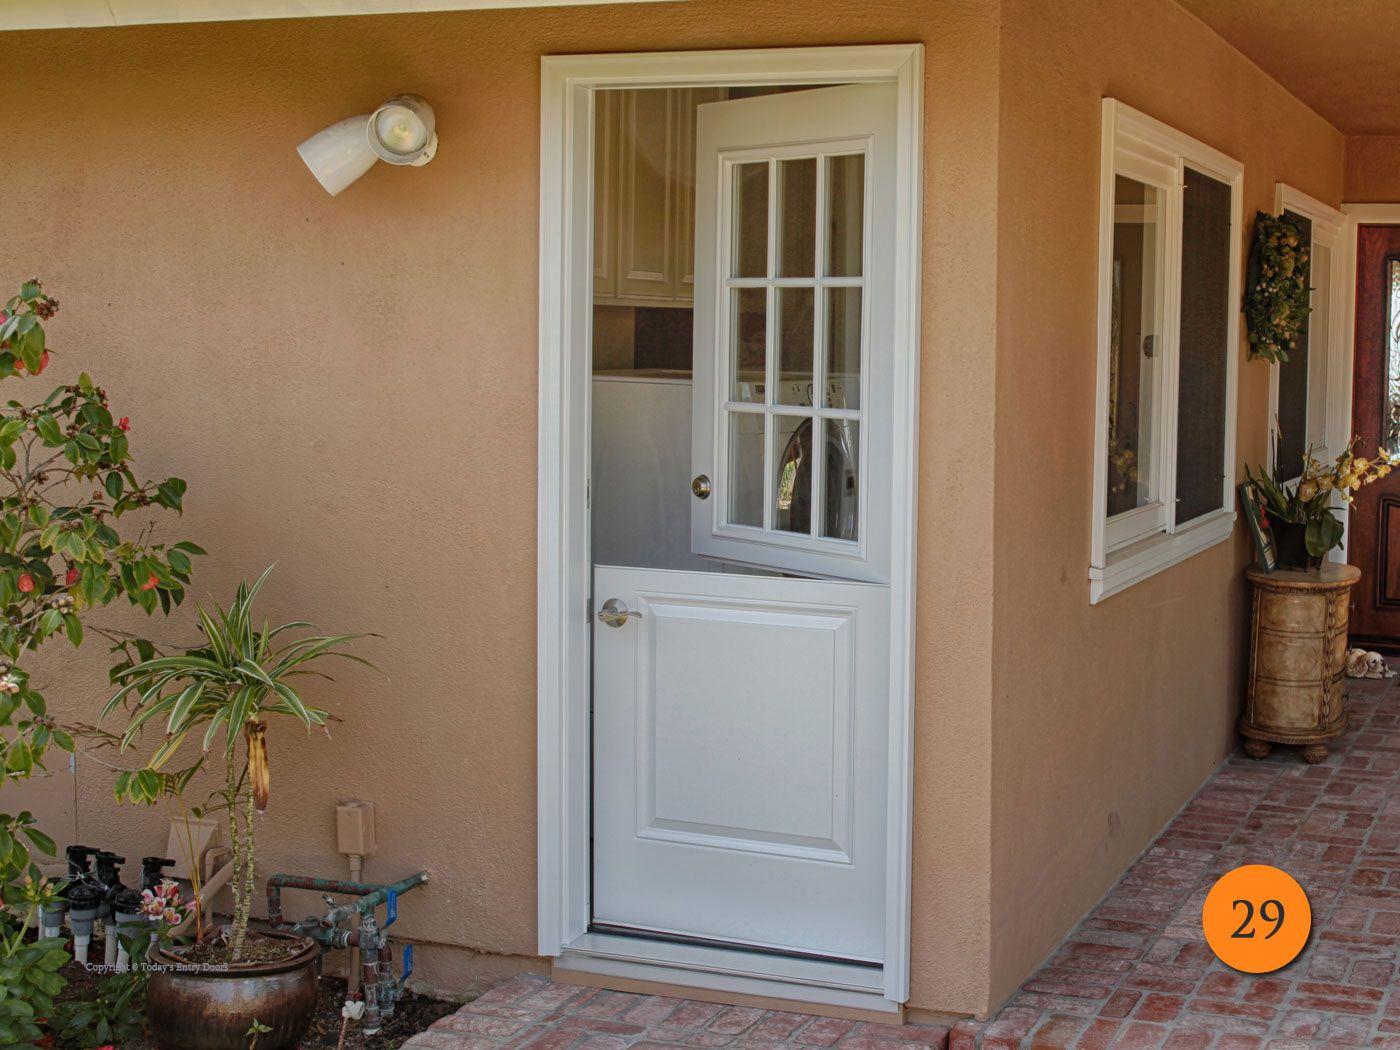 Single Side Dutch Door 32 X80 Plastpro Drs2b Fiberglass Smooth Surface Painted White 9 Lite Clear Glass Installed In Corona Del Mar Ca